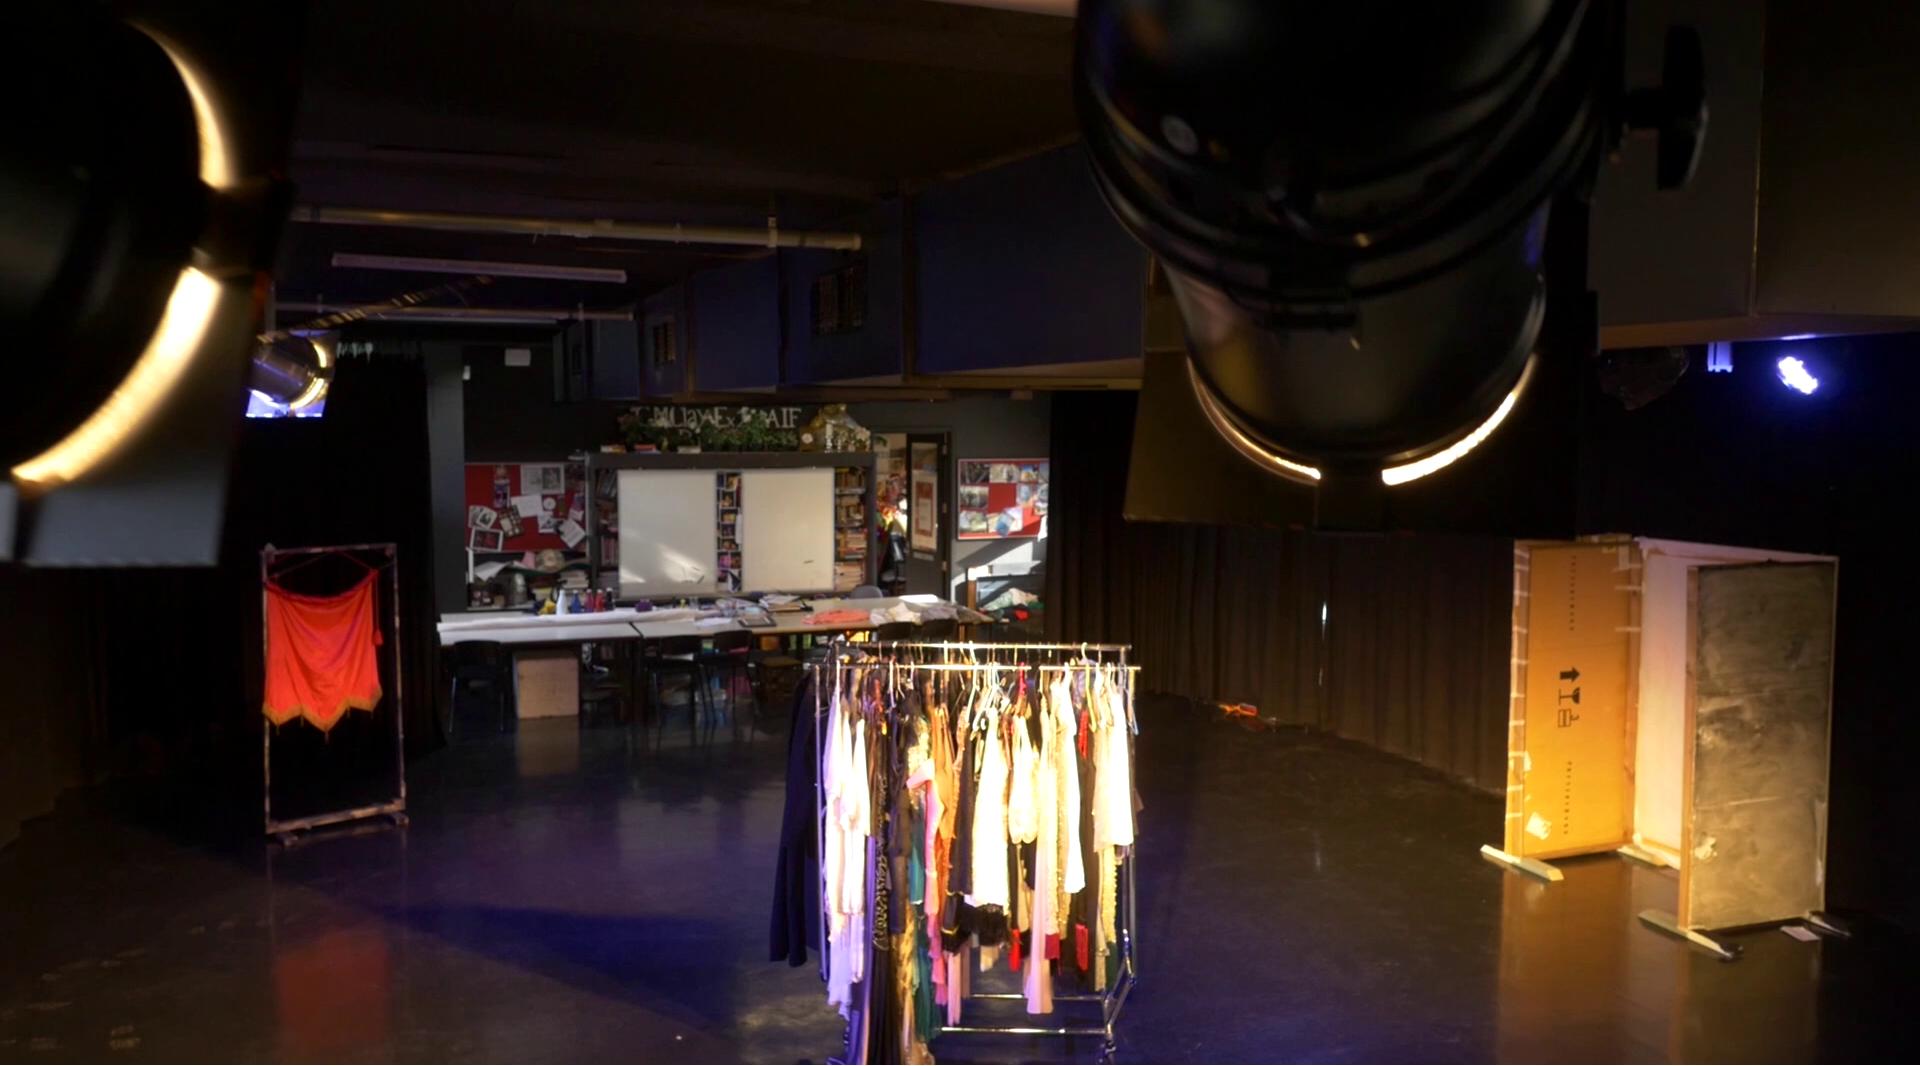 Facilities drama